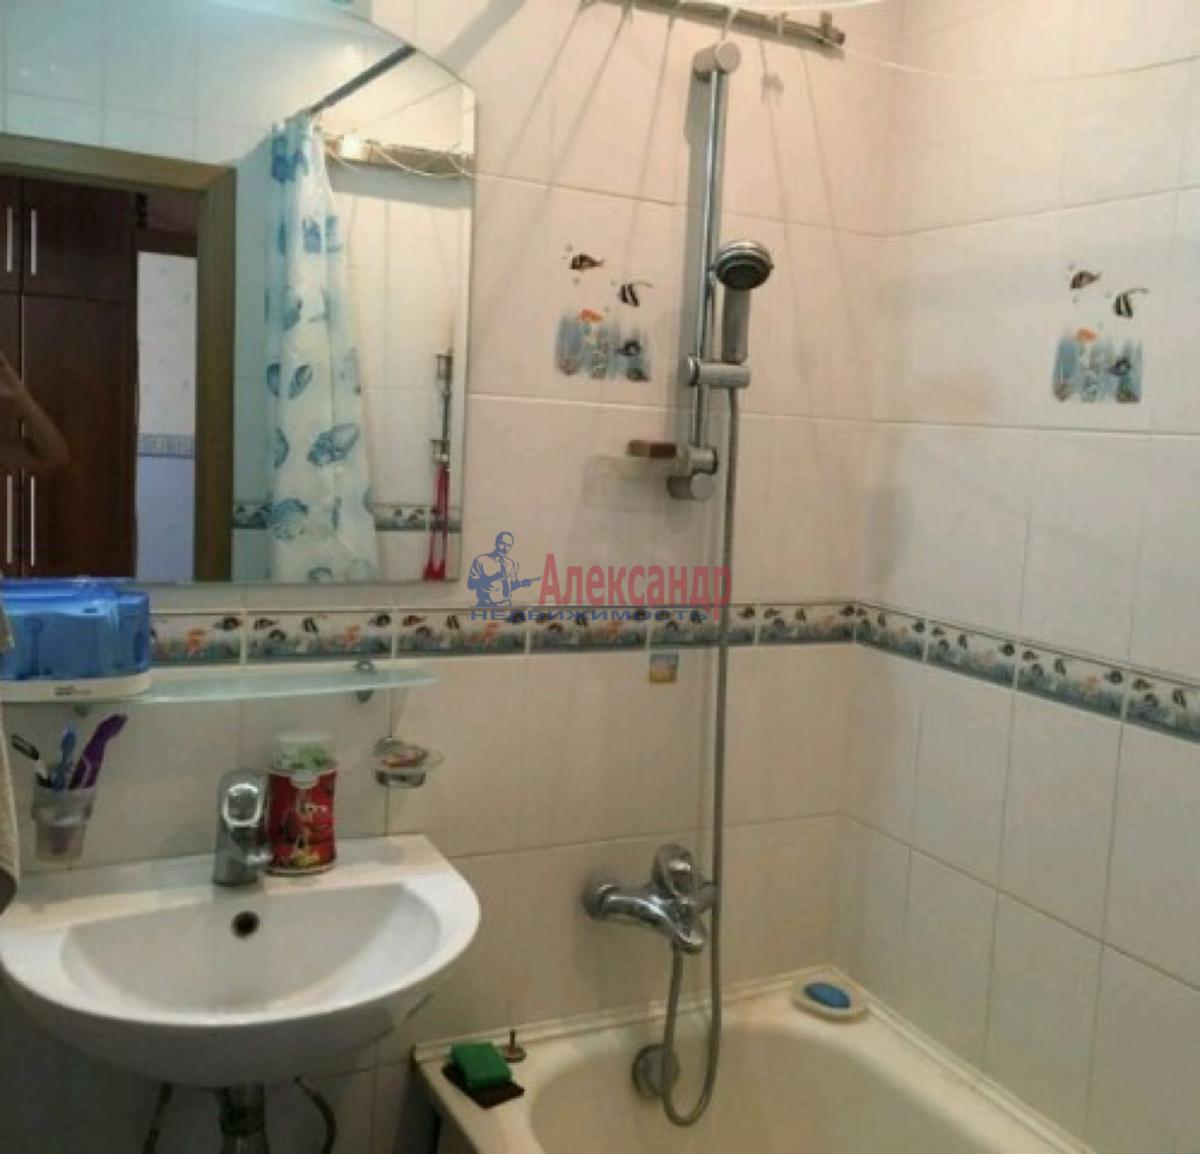 1-комнатная квартира (40м2) в аренду по адресу Танкиста Хрустицкого ул., 9— фото 3 из 4